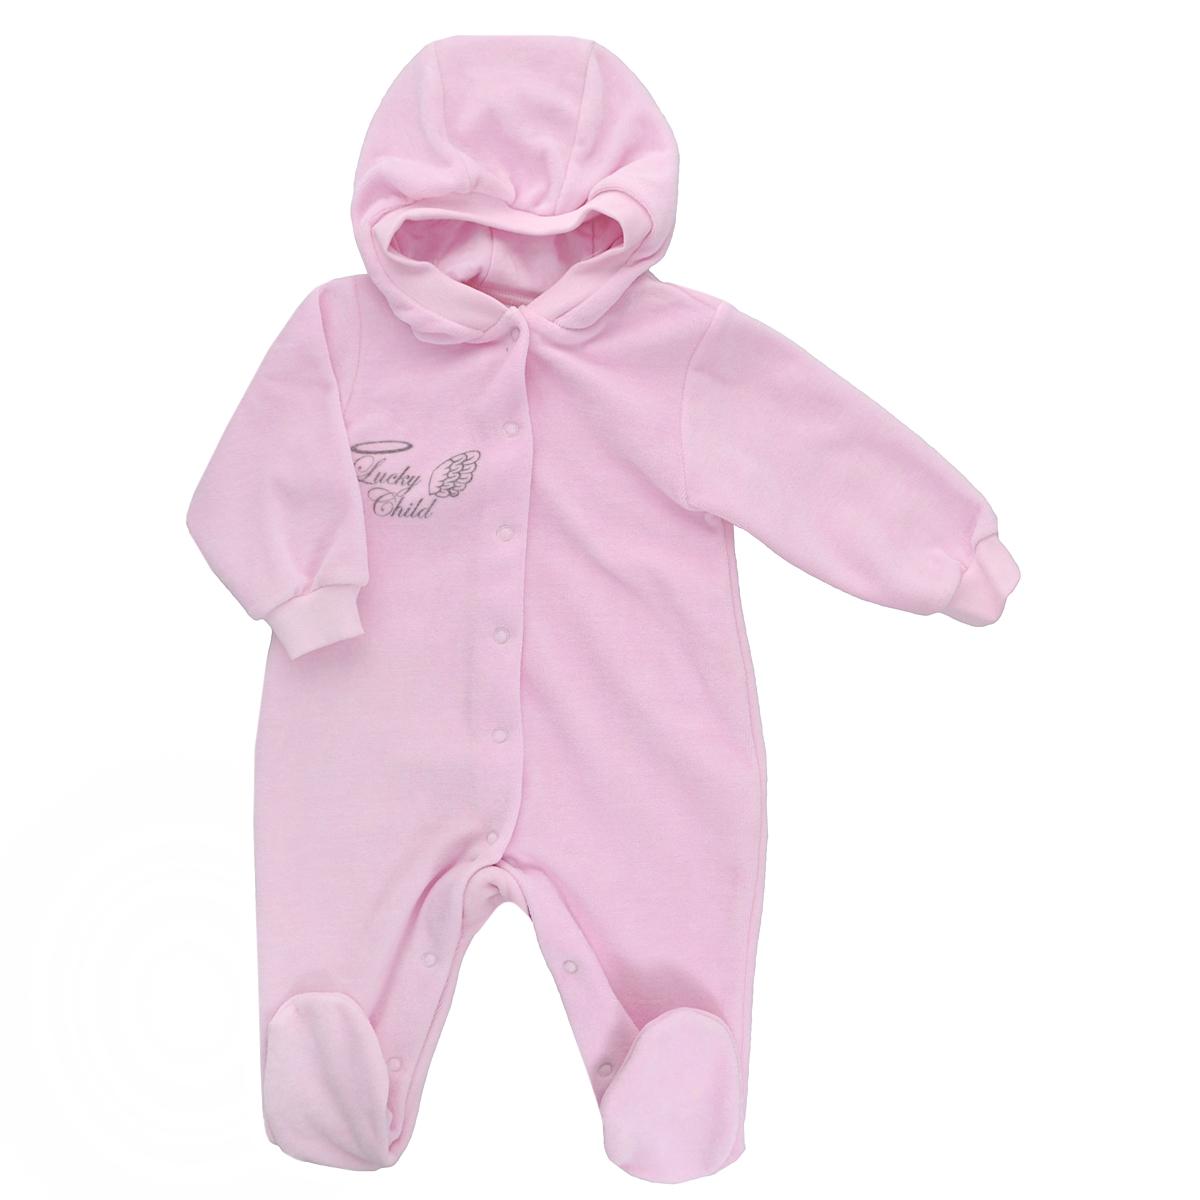 Комбинезон детский Lucky Child Ангелы, цвет: розовый. 17-3. Размер 74/80 комбинезон lucky child ангелочки розовый размер 24 74 80